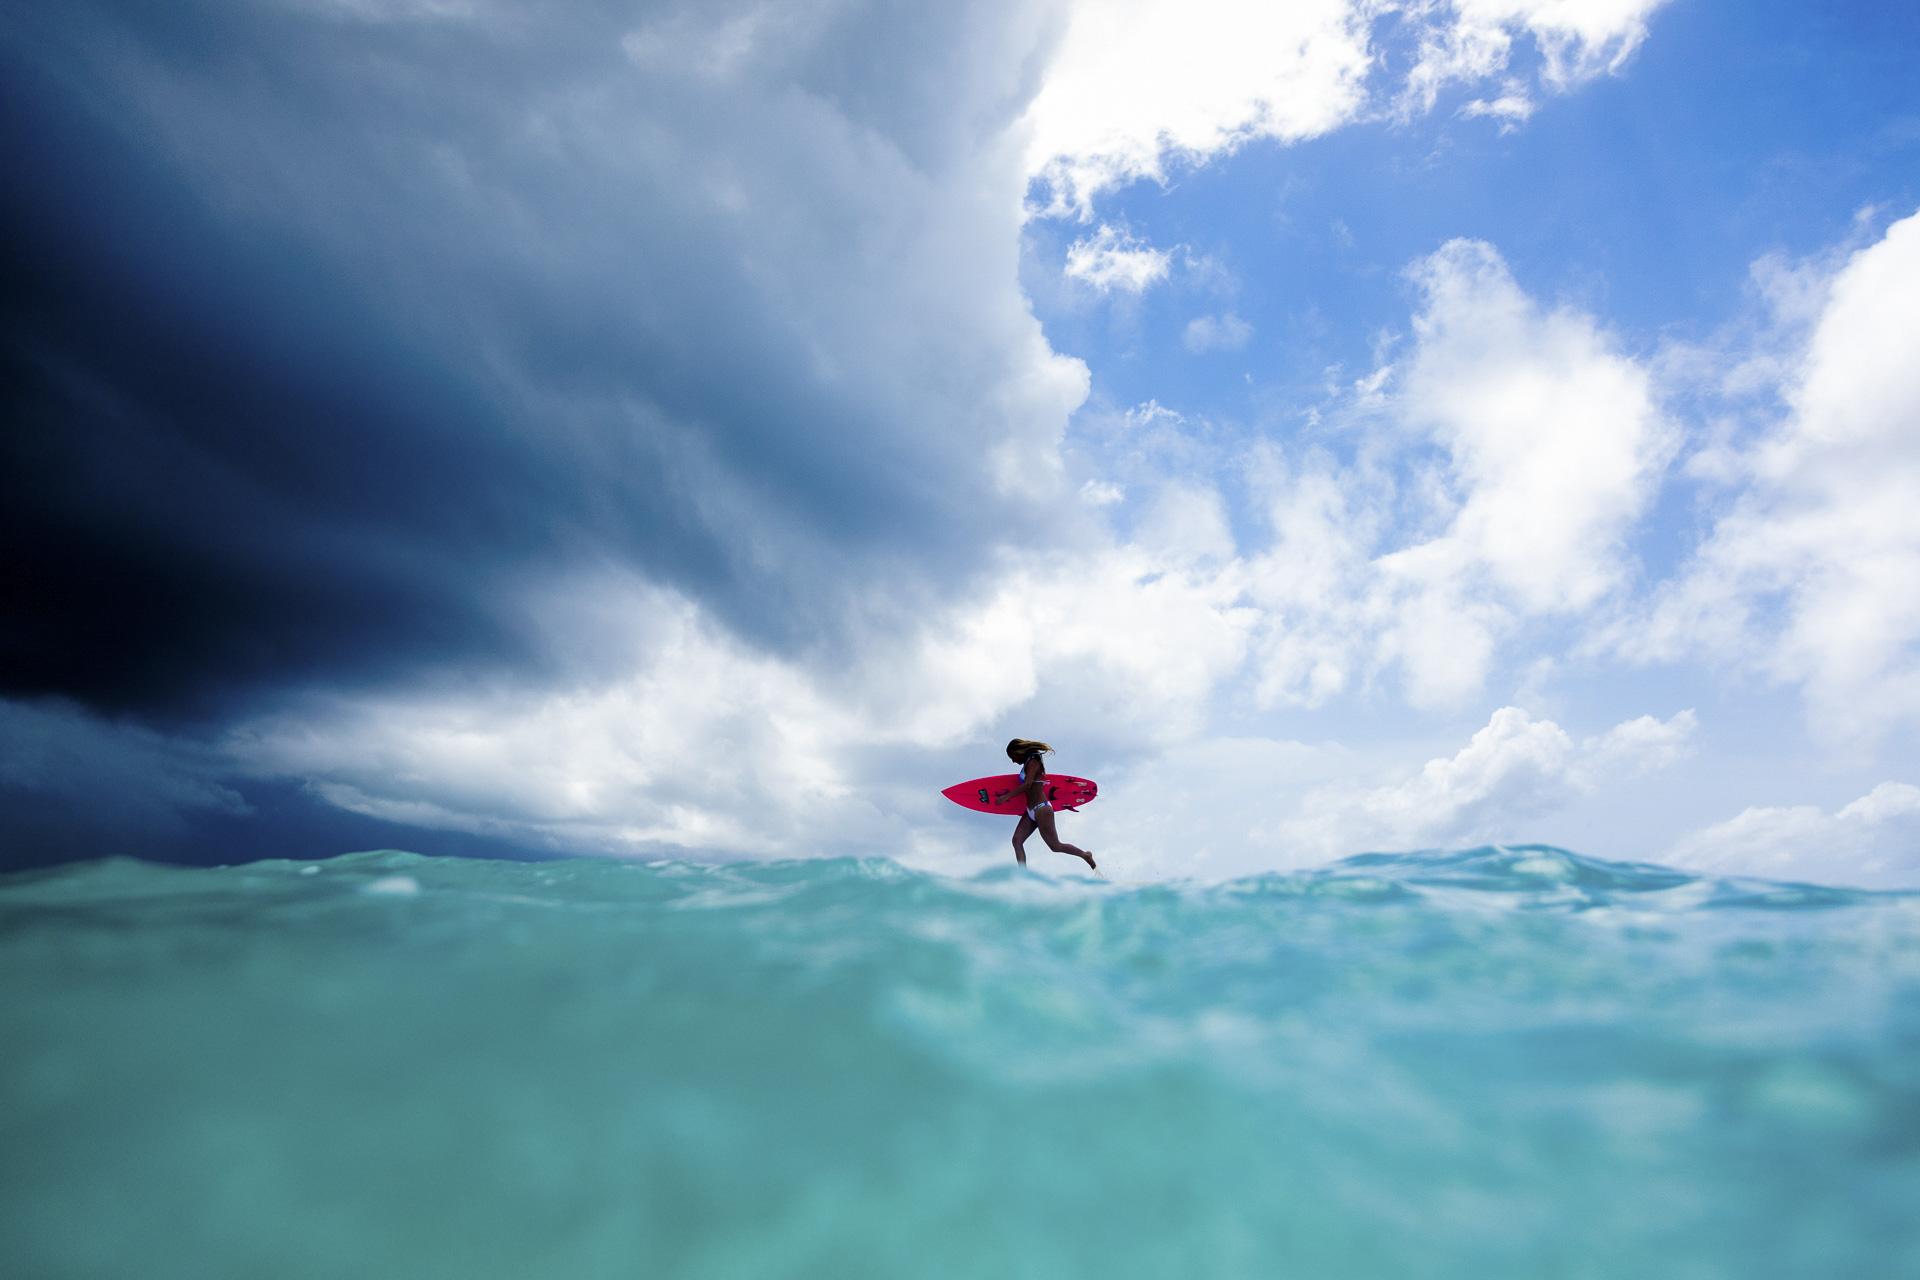 SarahLeePhoto_Storm_Chasing_Surfer_Girl.jpg